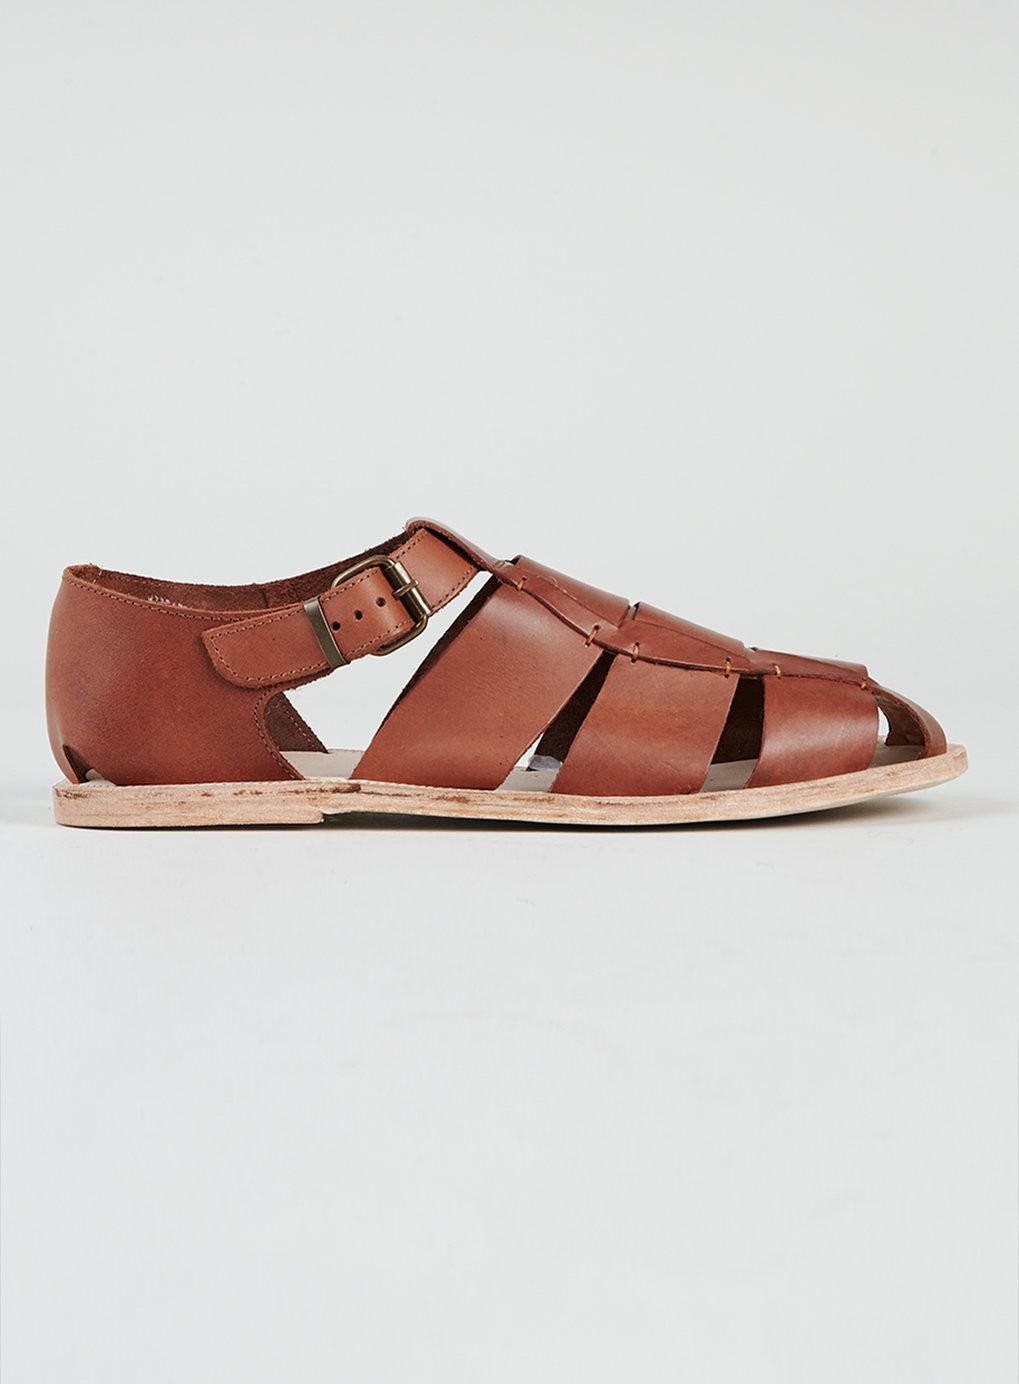 Hudson Agali Tan Leather Sandals | Tan